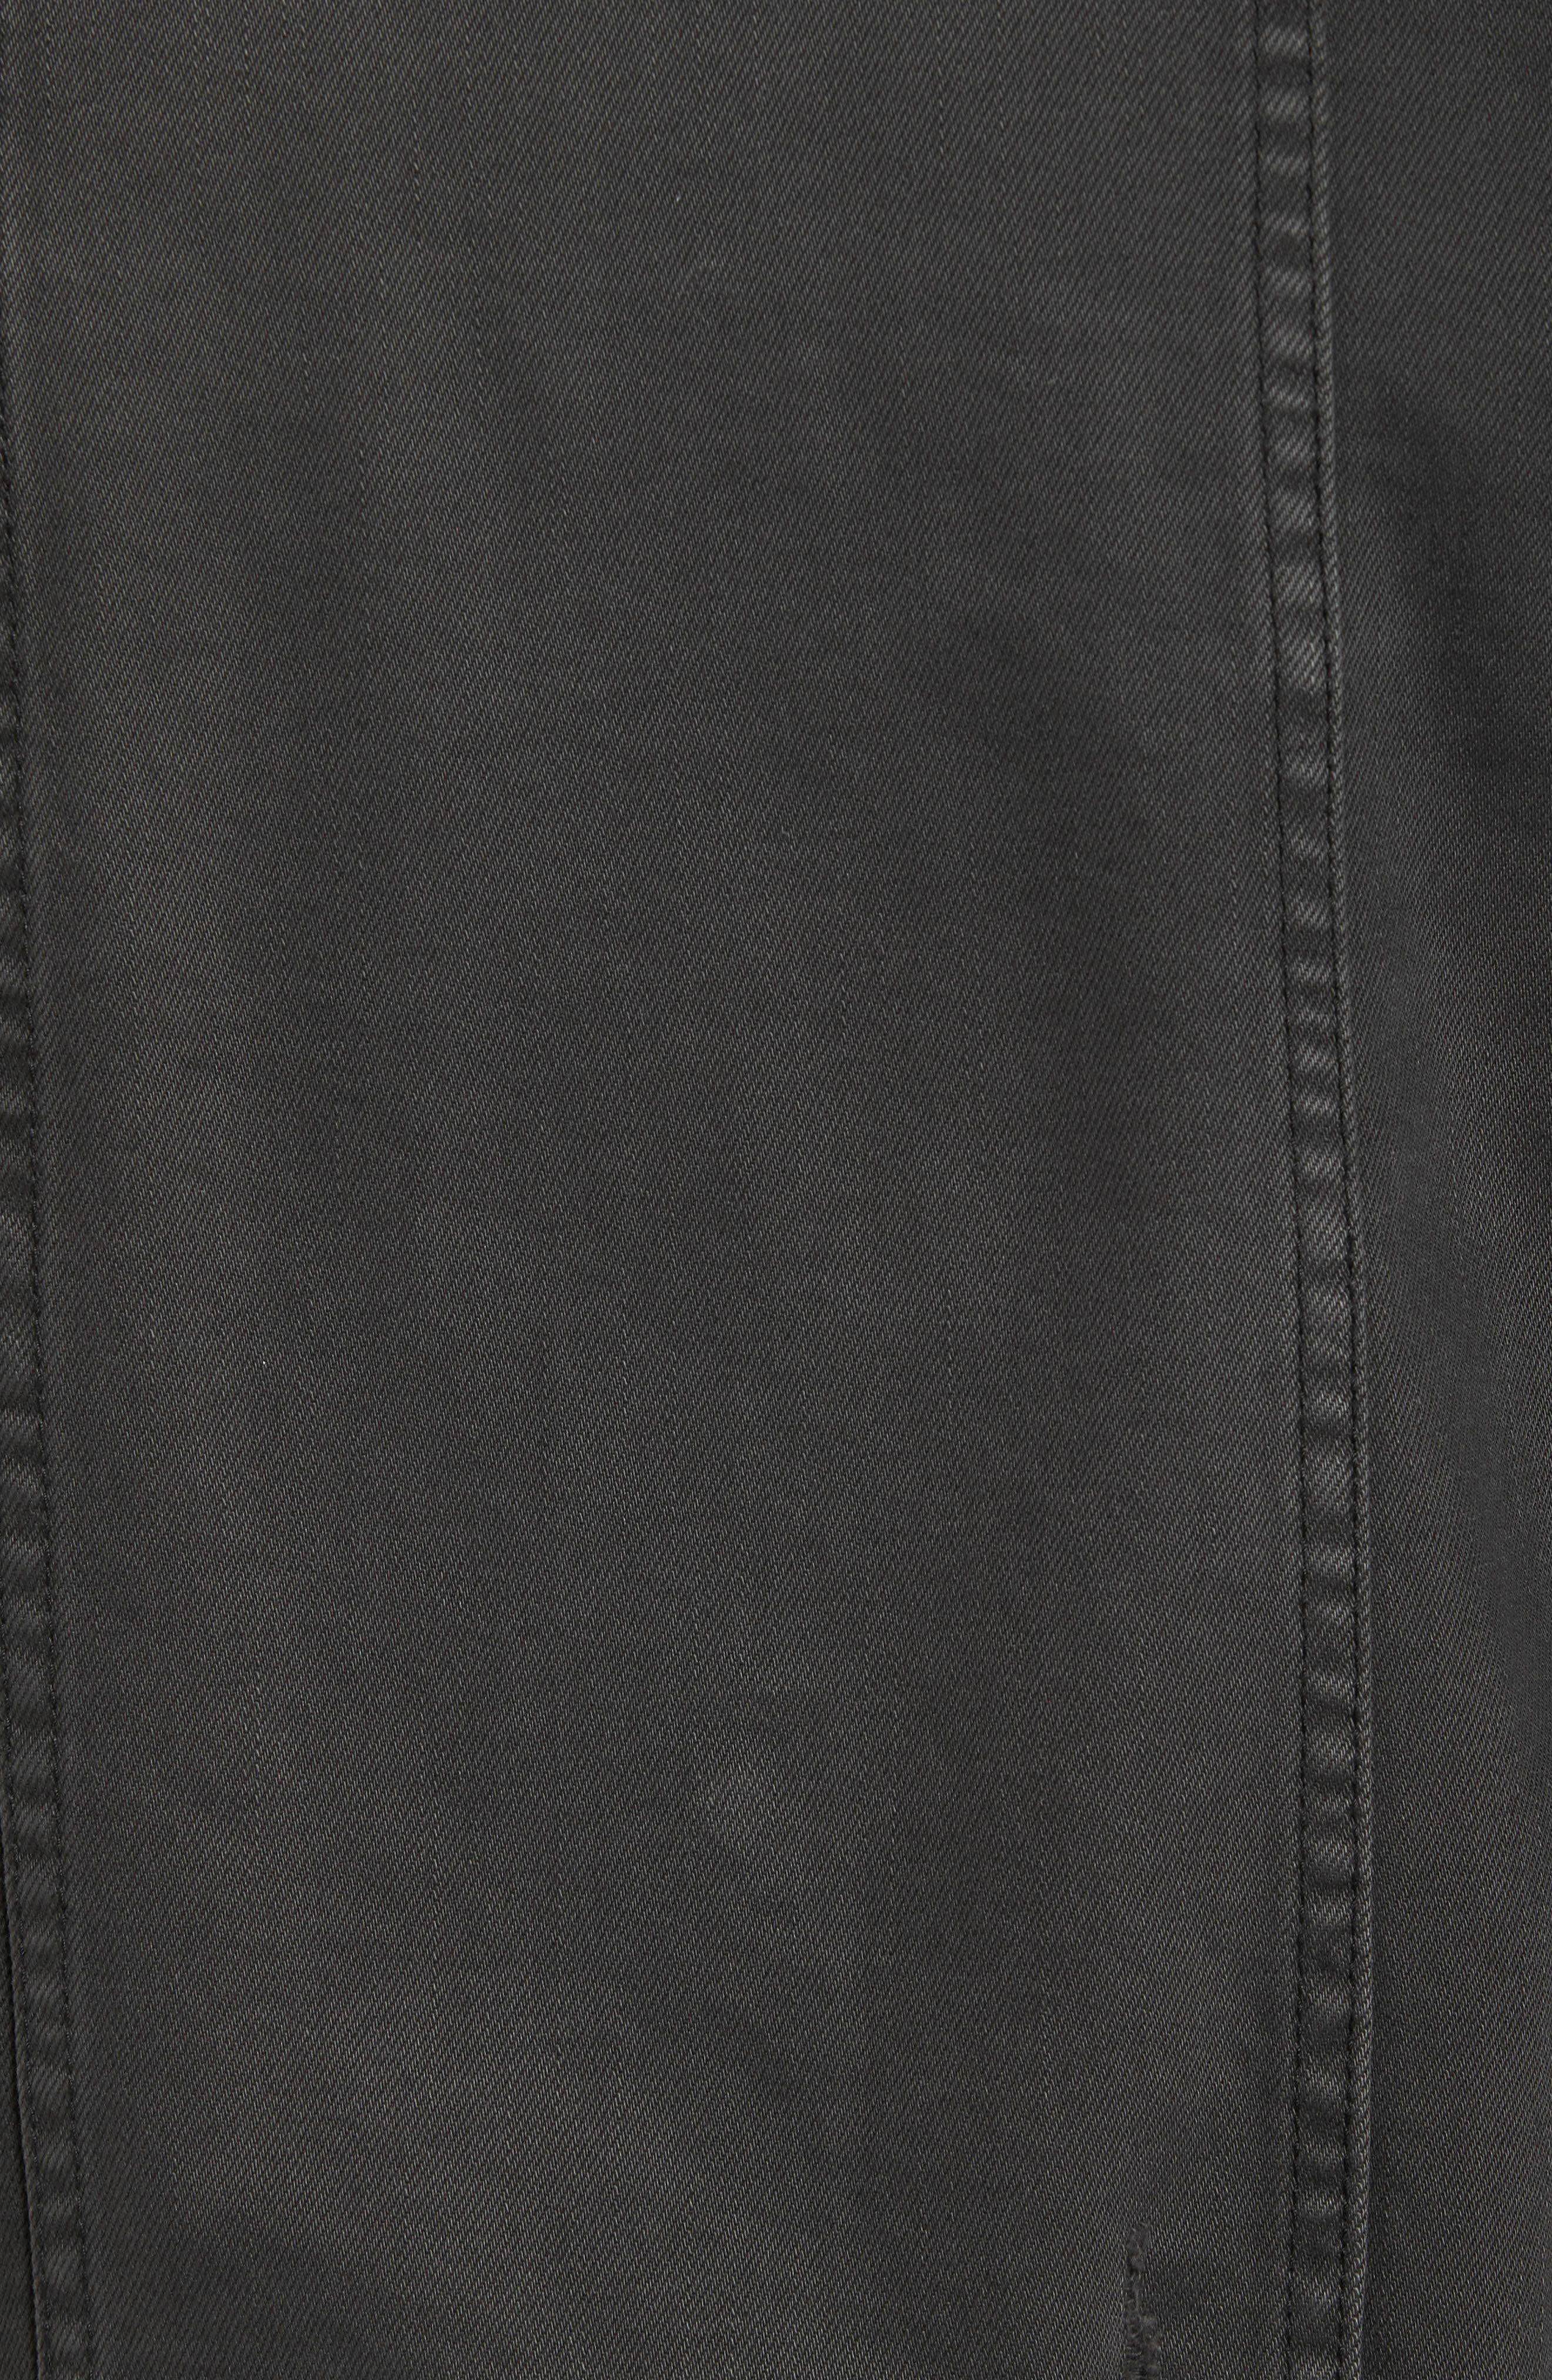 Norge Denim Jacket,                             Alternate thumbnail 5, color,                             019